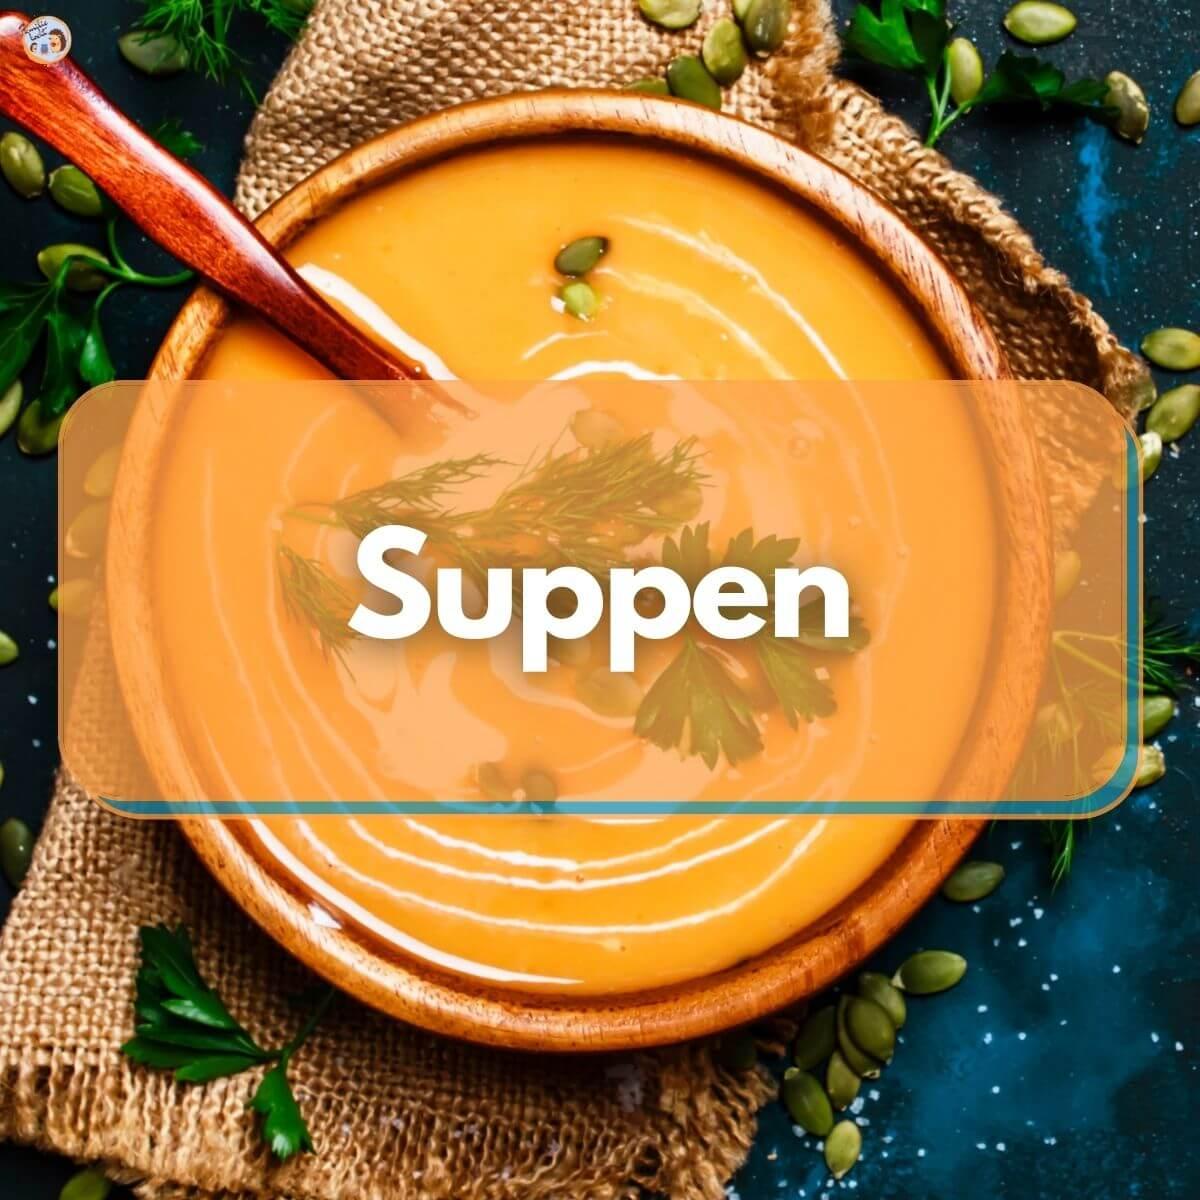 Suppen